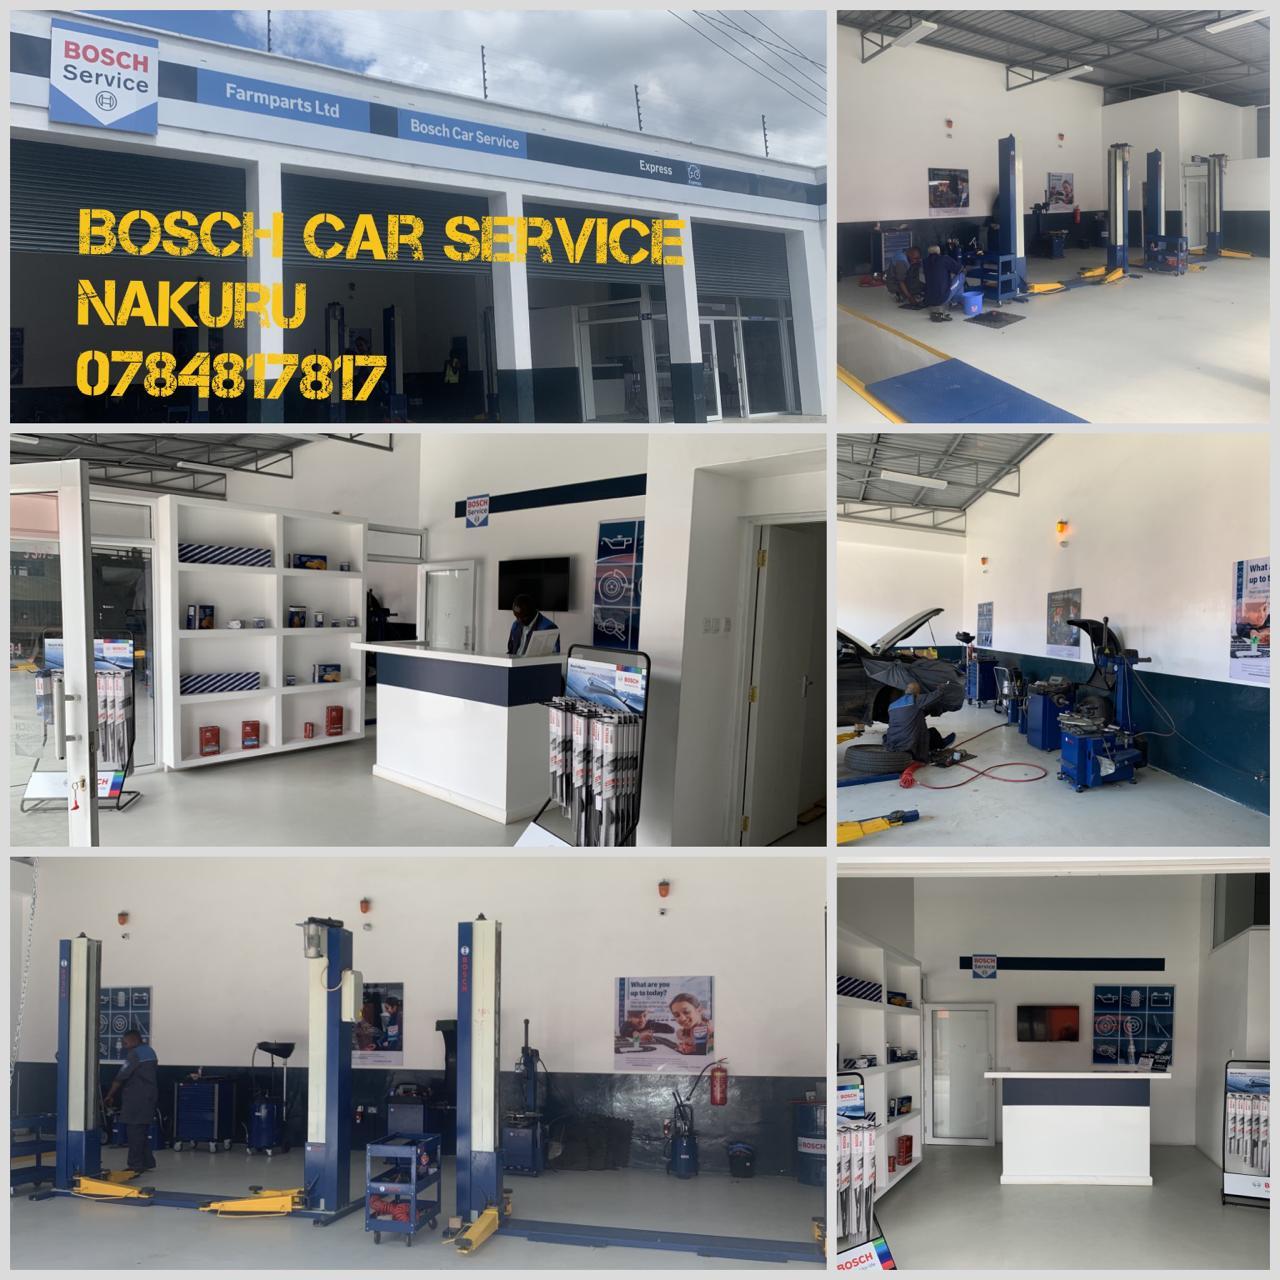 About Bosch Car Centre